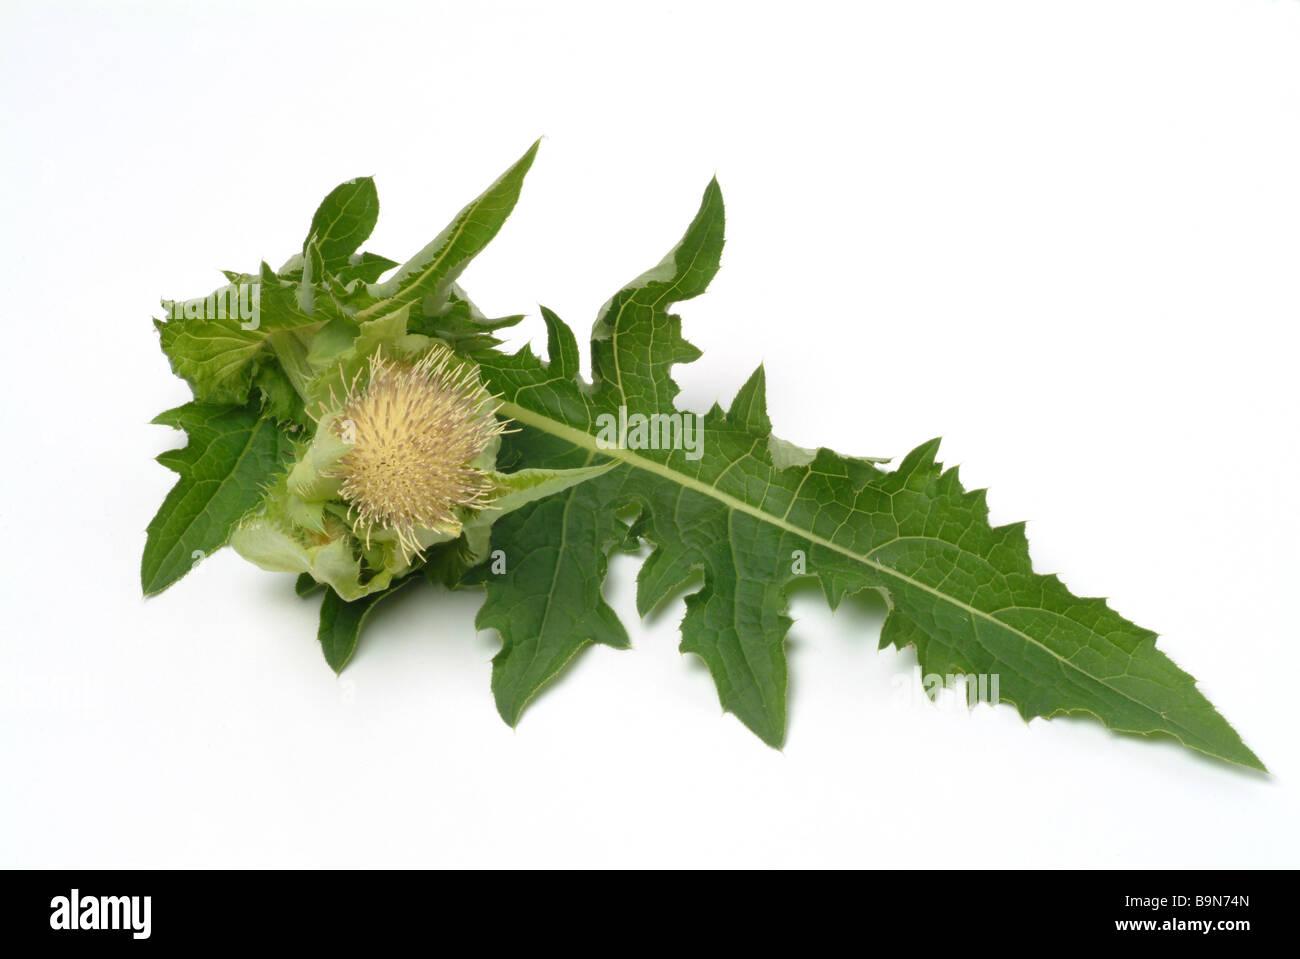 Medicinal plant Cabbage Thistle Kohldistel Cirsium oleraceum - Stock Image